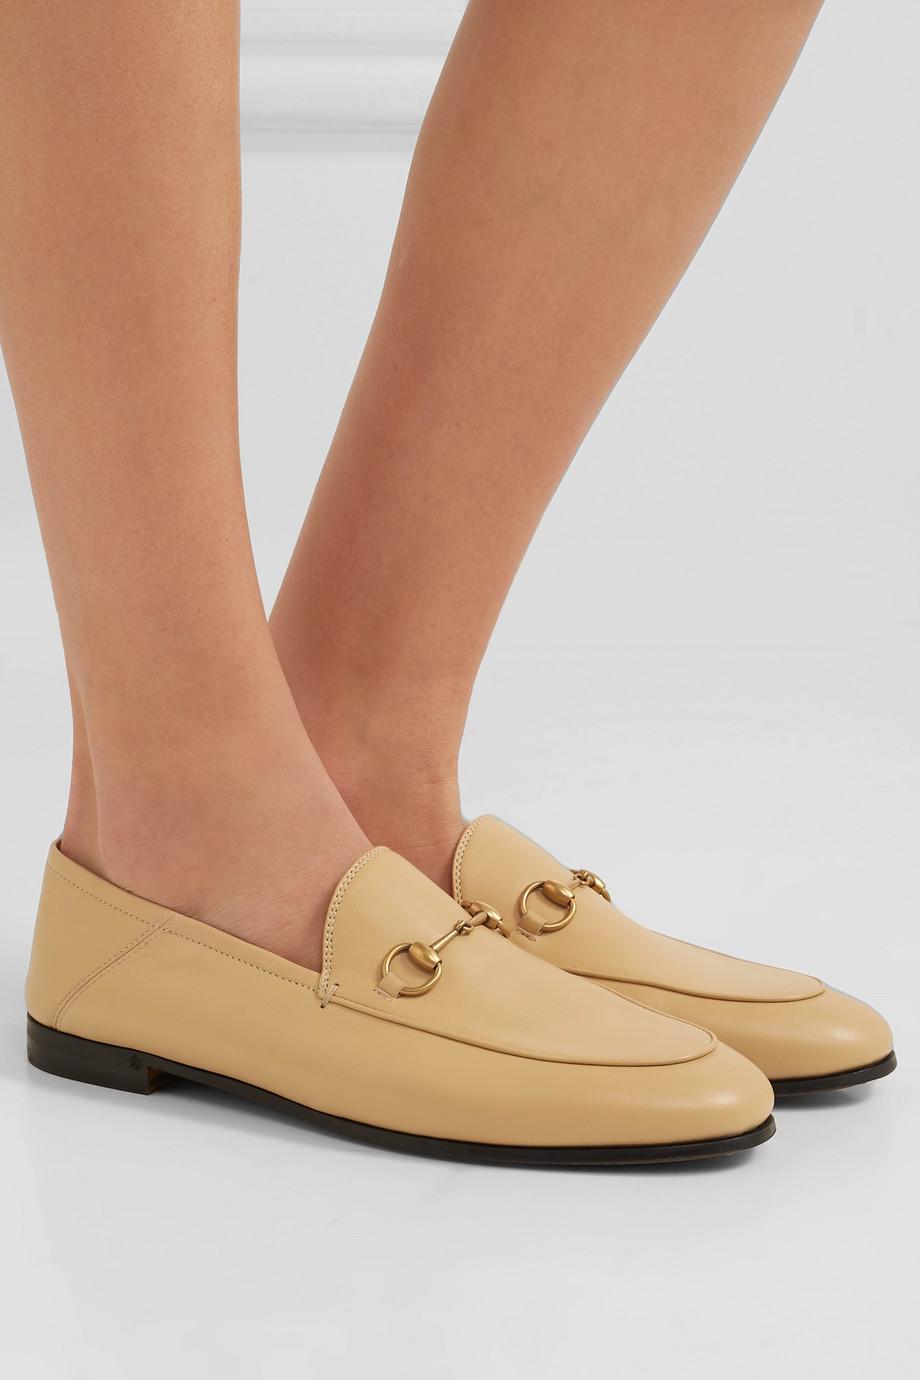 Gucci Brixton 马衔扣细节折叠式后跟皮革乐福鞋